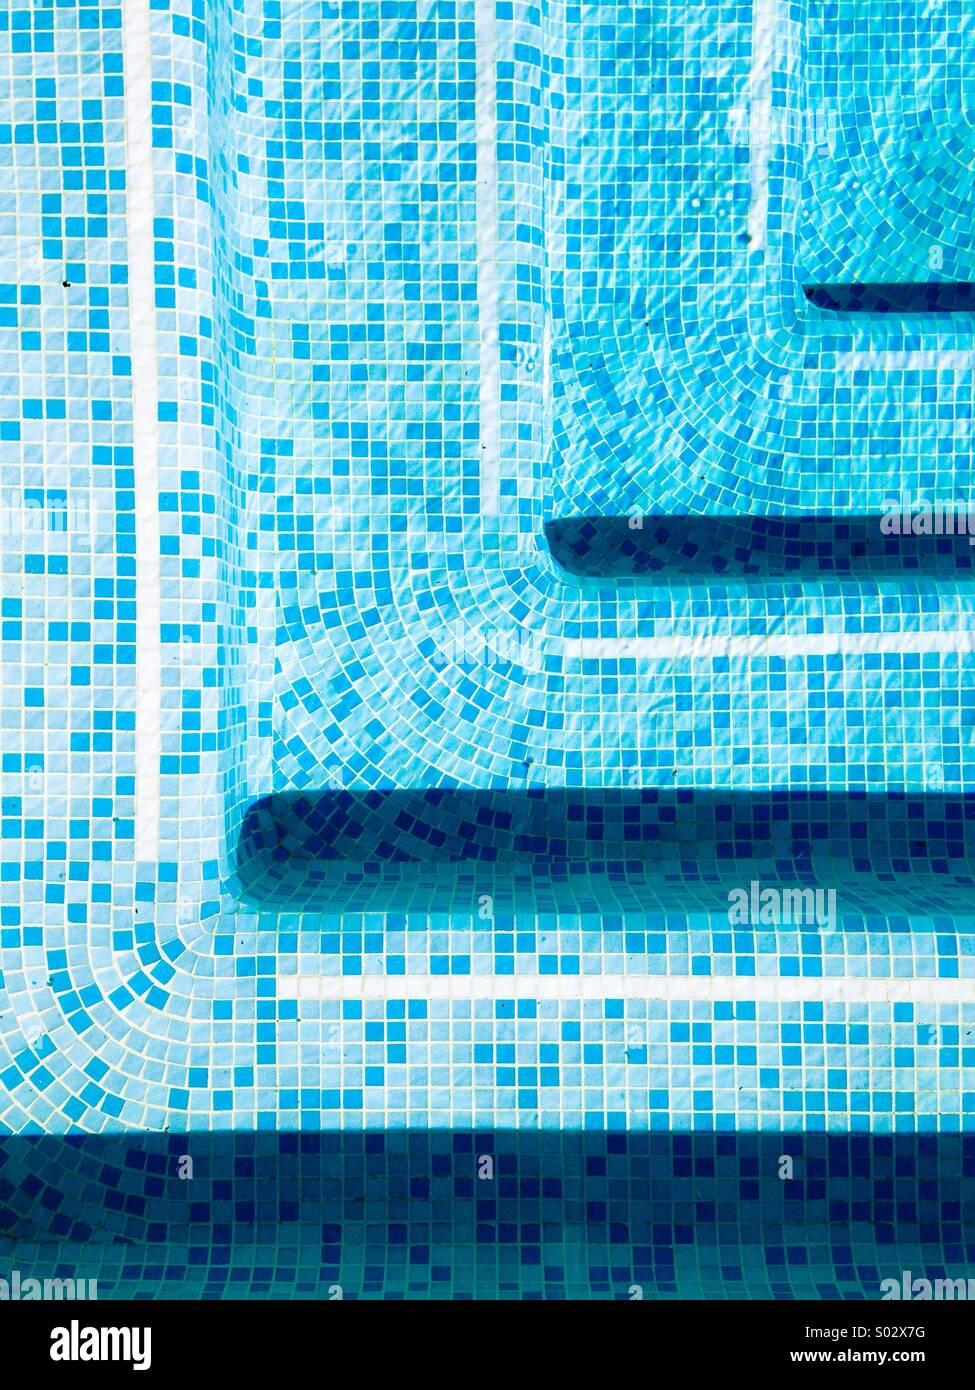 Swimming Pool Steps - Stock Image